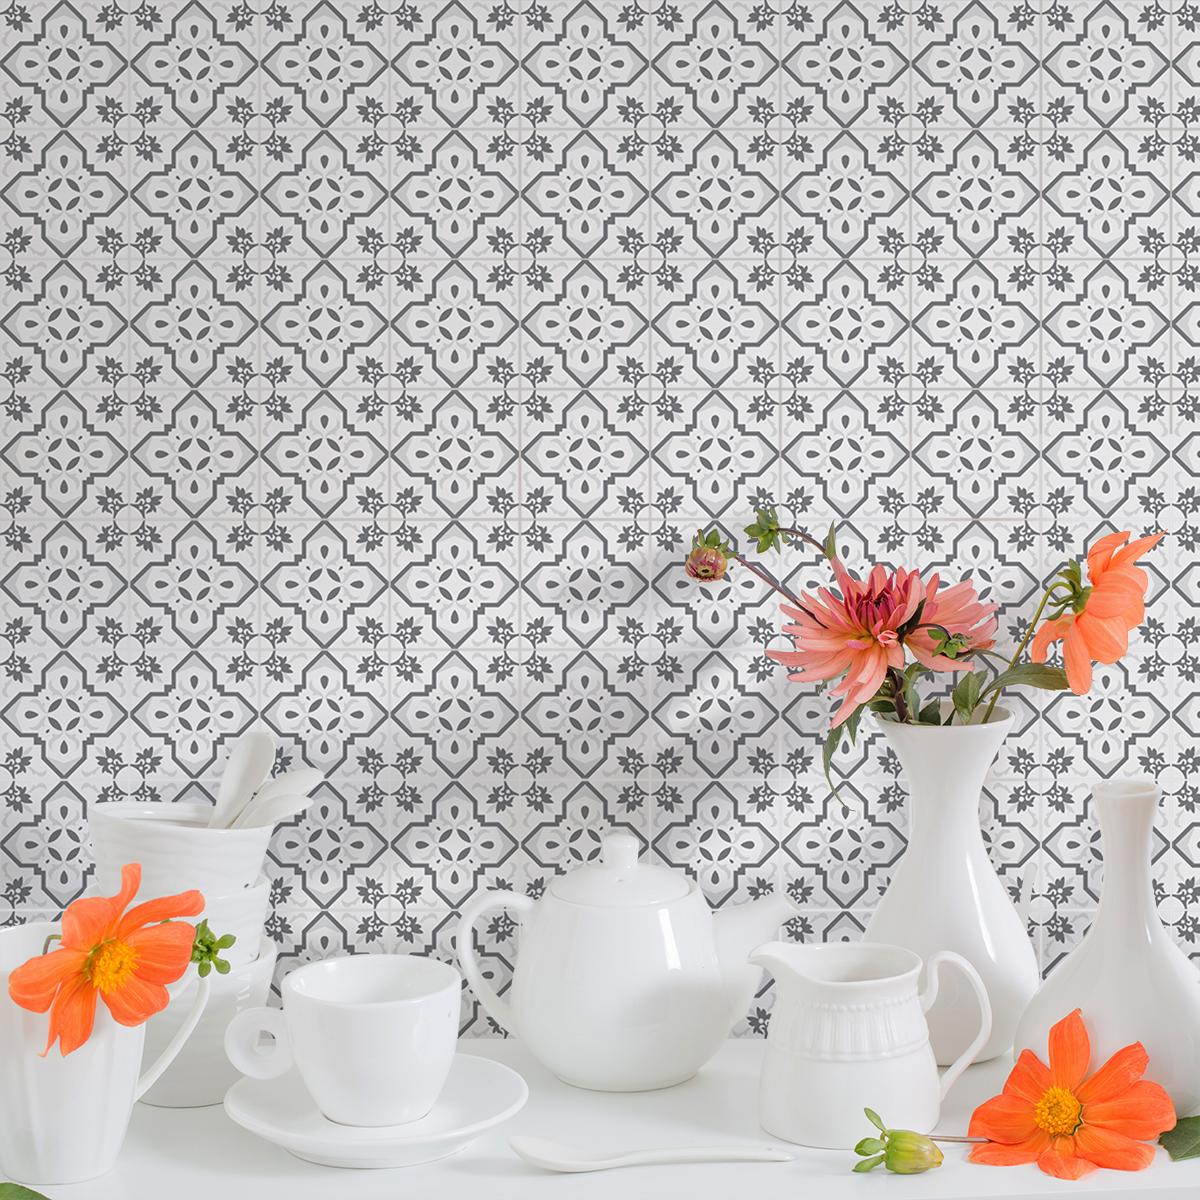 9 stickers carrelages azulejos ancelina cuisine. Black Bedroom Furniture Sets. Home Design Ideas